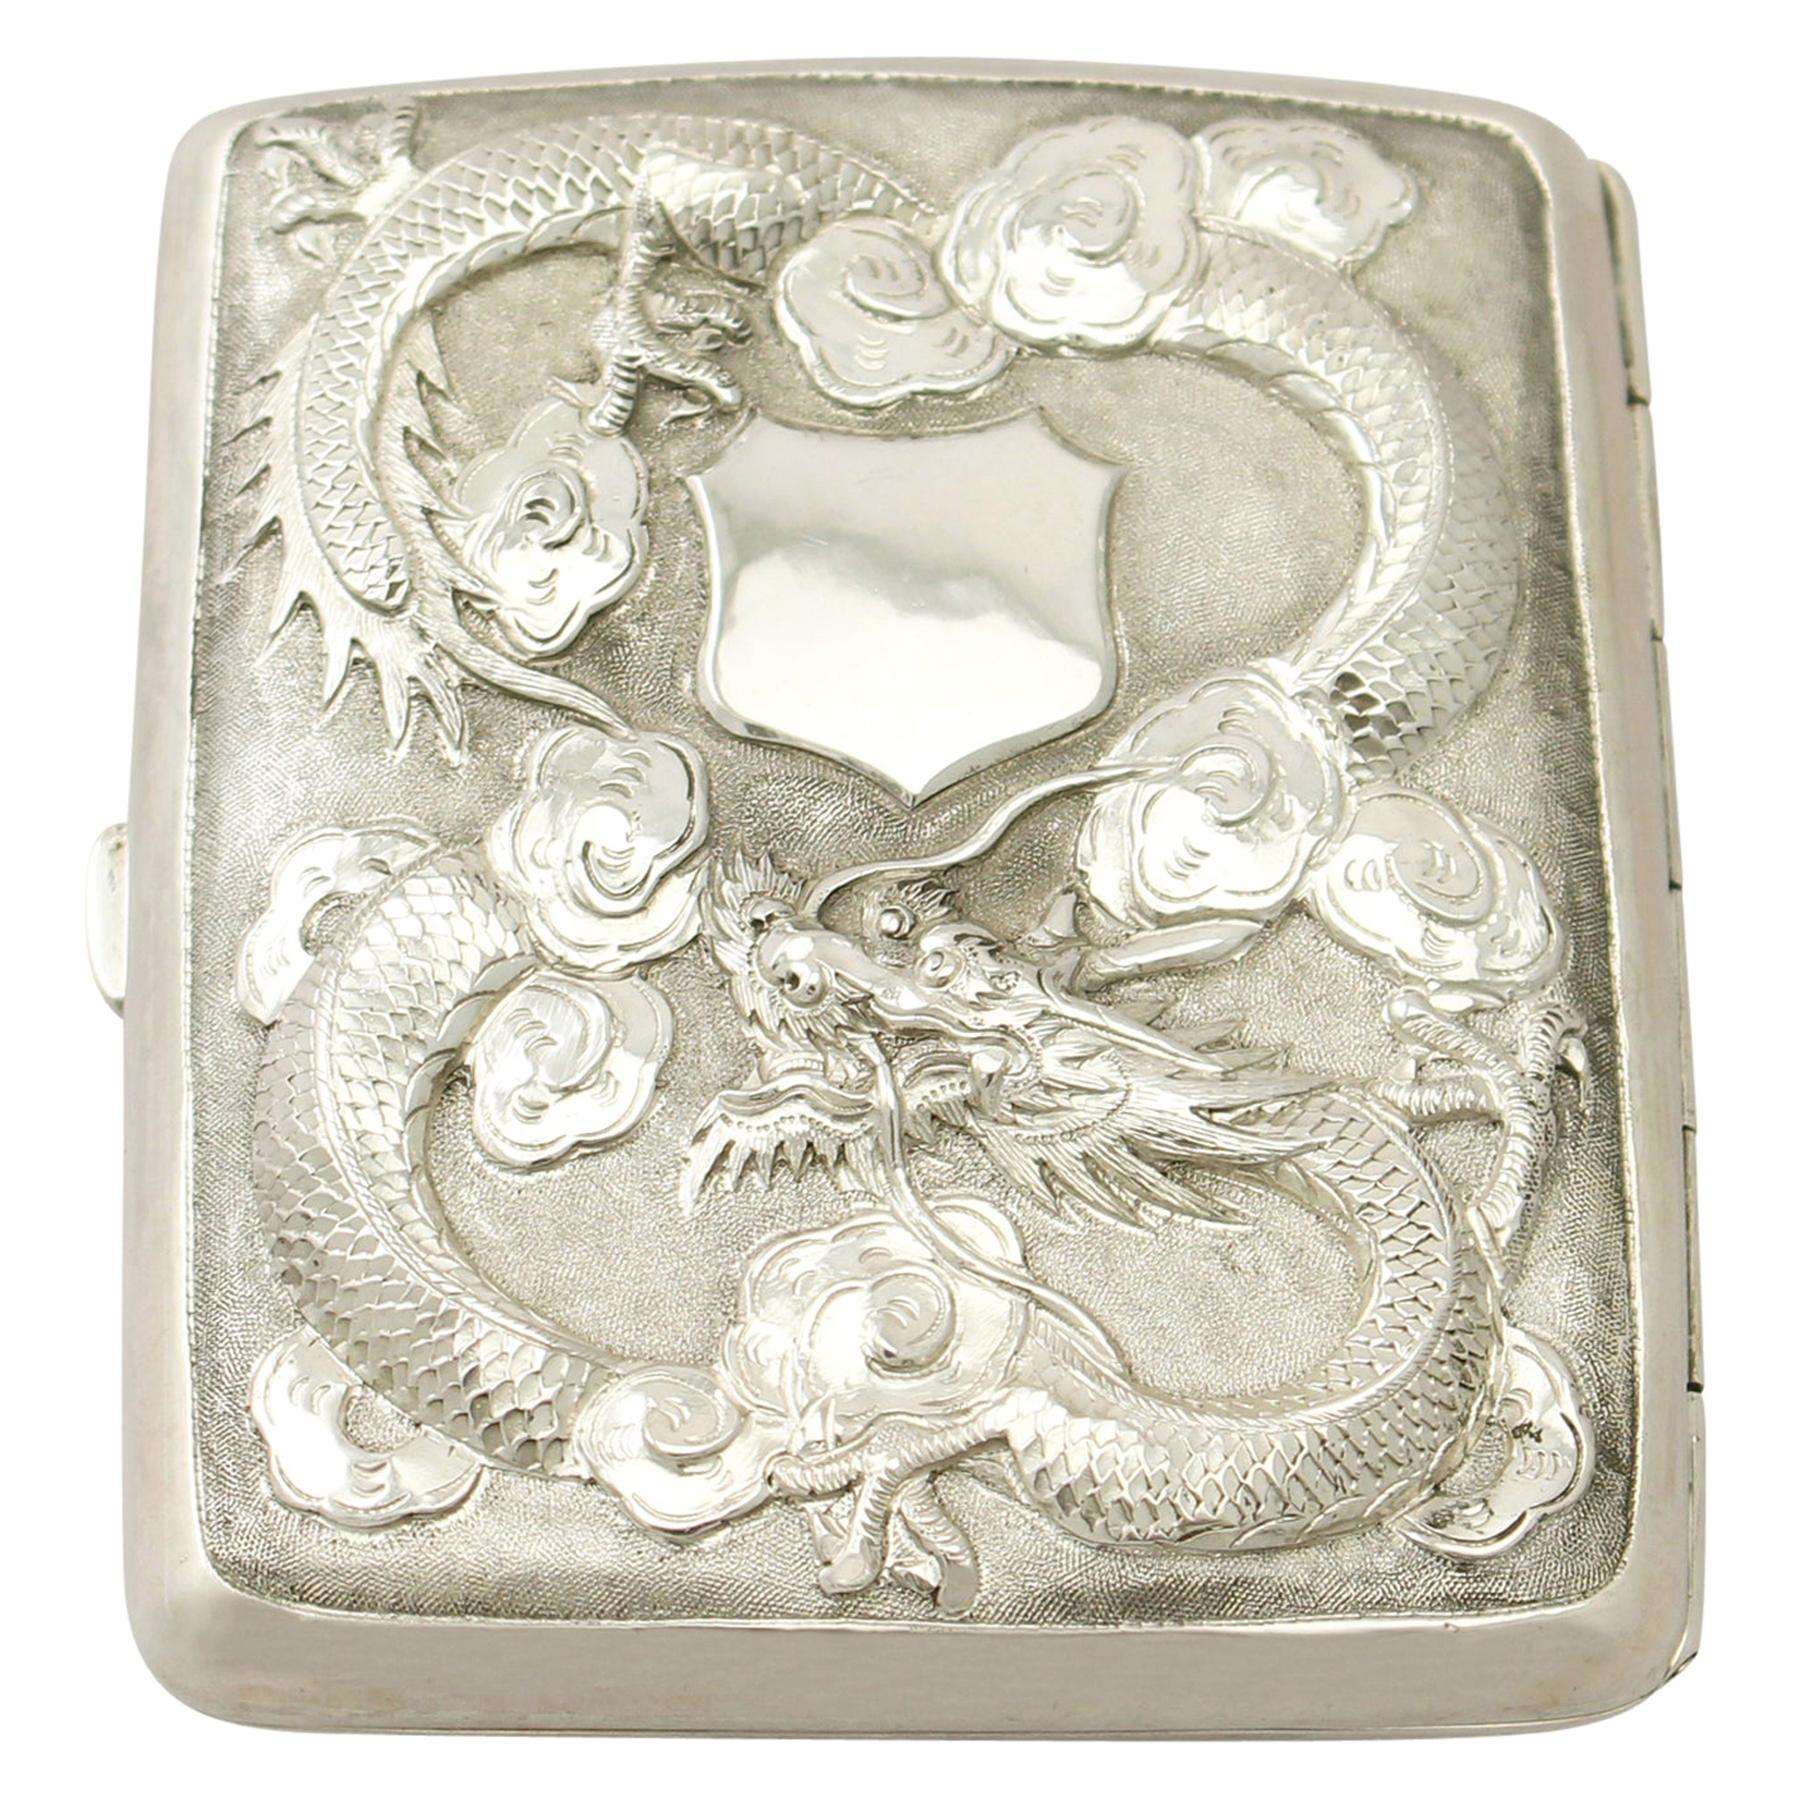 Antique Chinese Export Silver Cigarette Case, Circa 1900